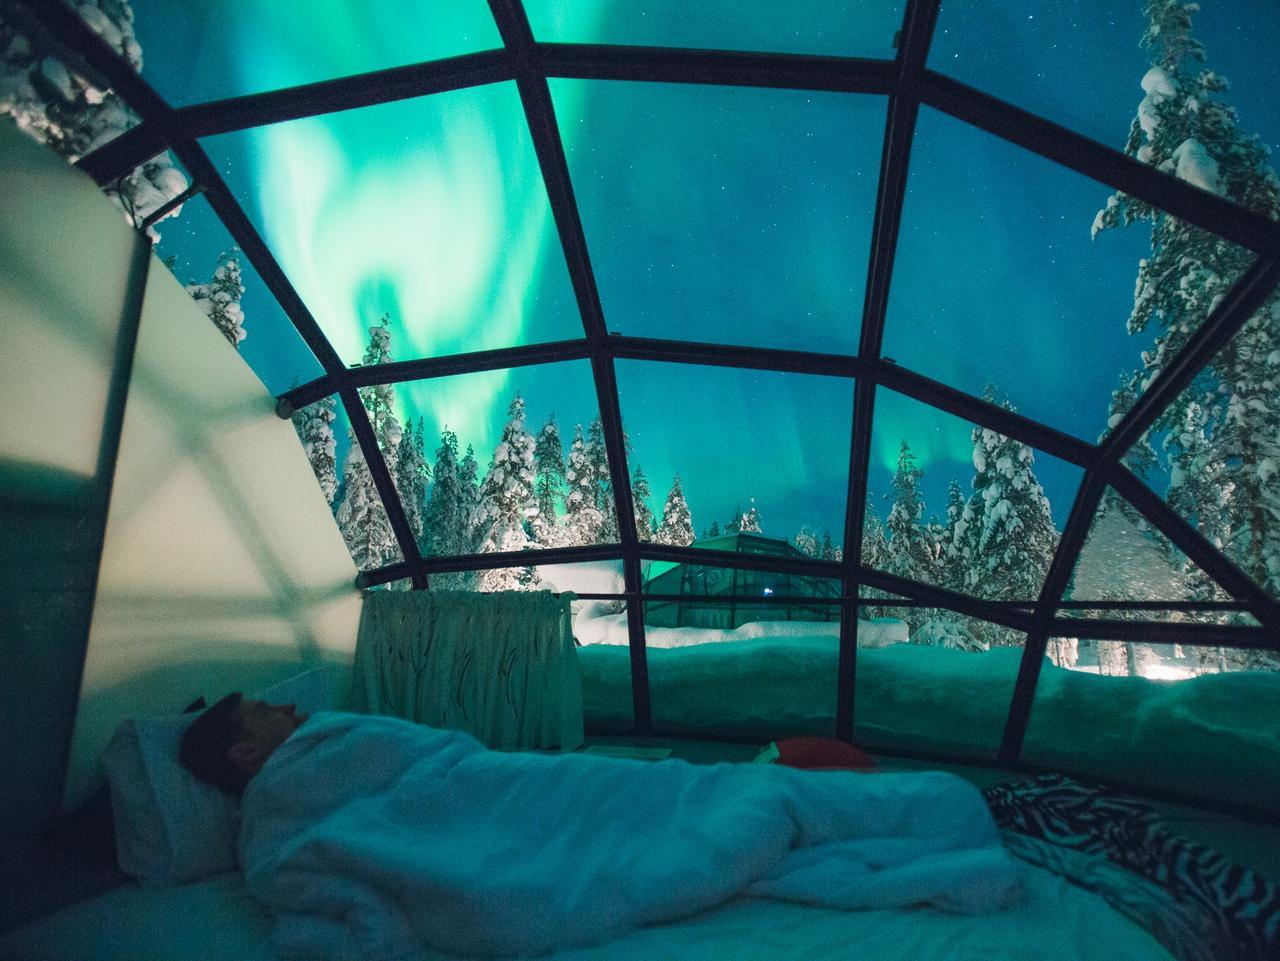 SUNDAY ESCAPE. NORTHERN LIGHTS. Kakslauttanen Arctic Resort, Finland. Picture: Kakslauttanen Arctic Resort